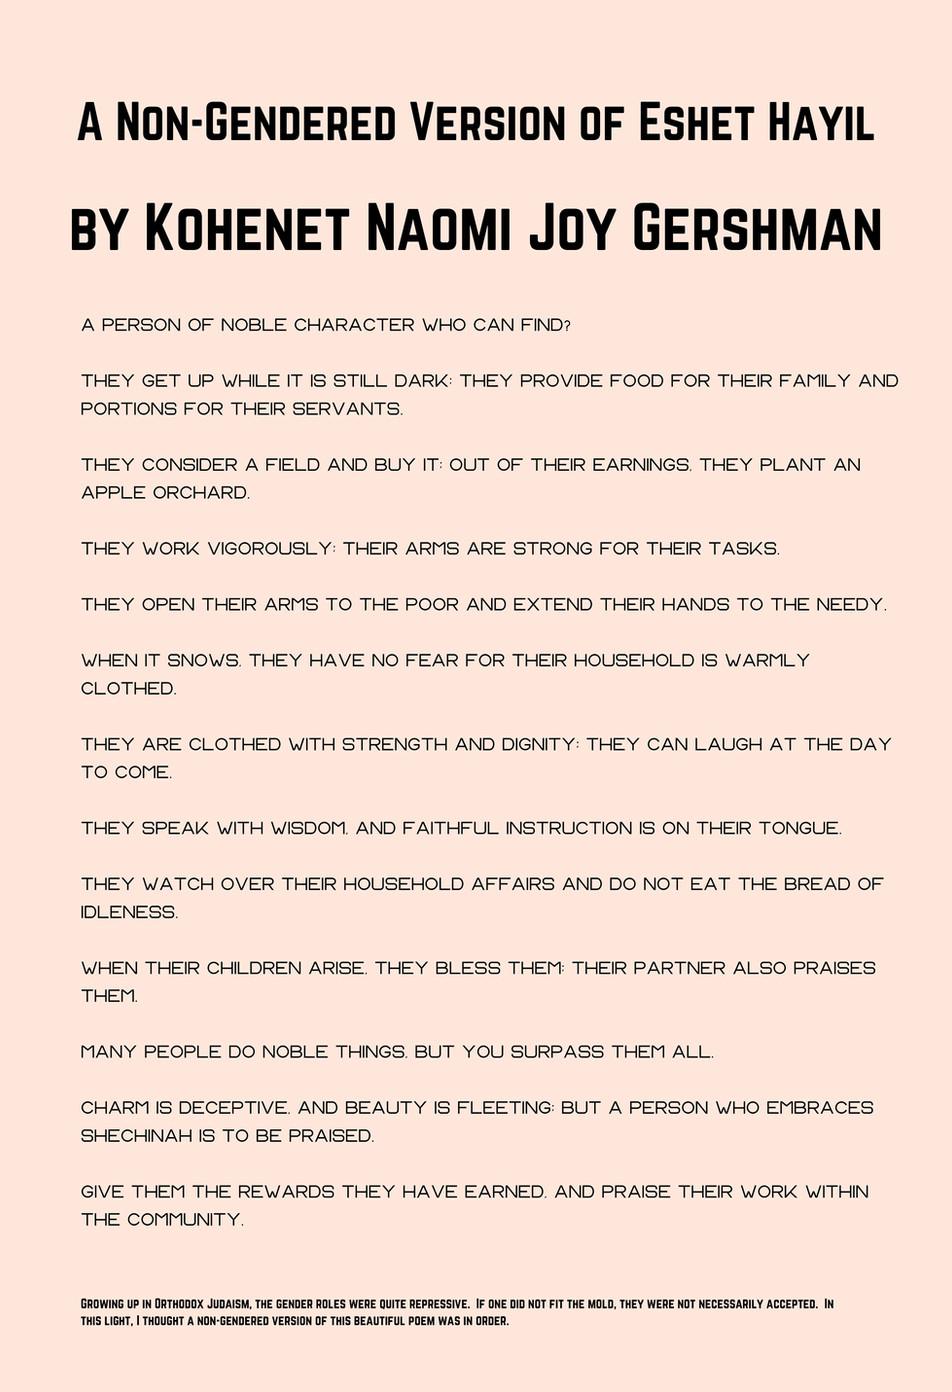 Kohenet Naomi Joy Gershman: A Non-Gendered Version of Eshet Hayil